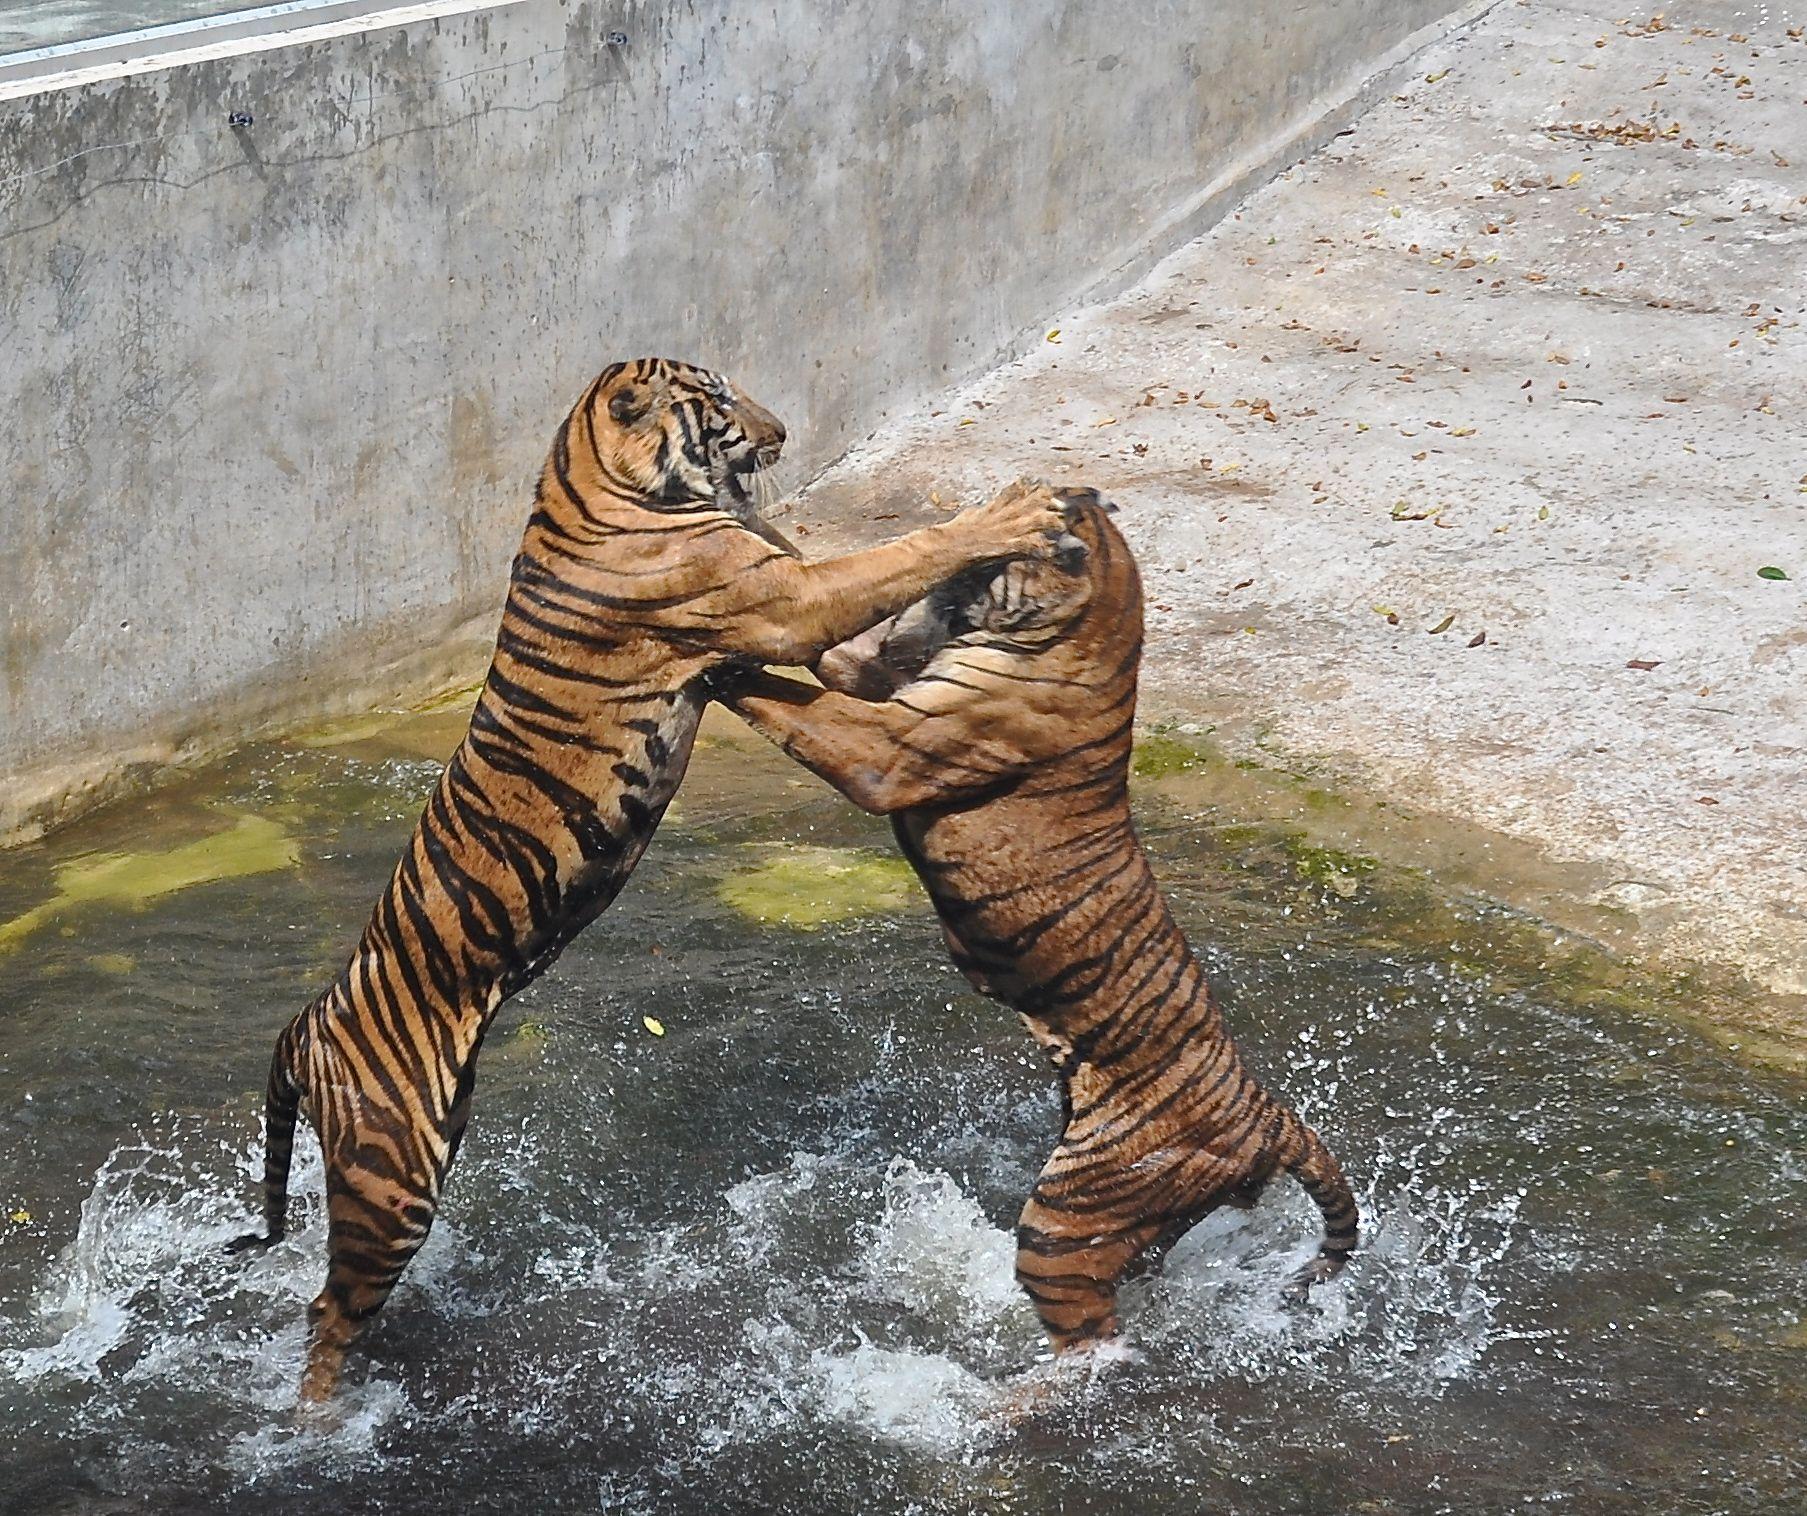 Male tigers fighting, Thailand tiger farm Stephanie V